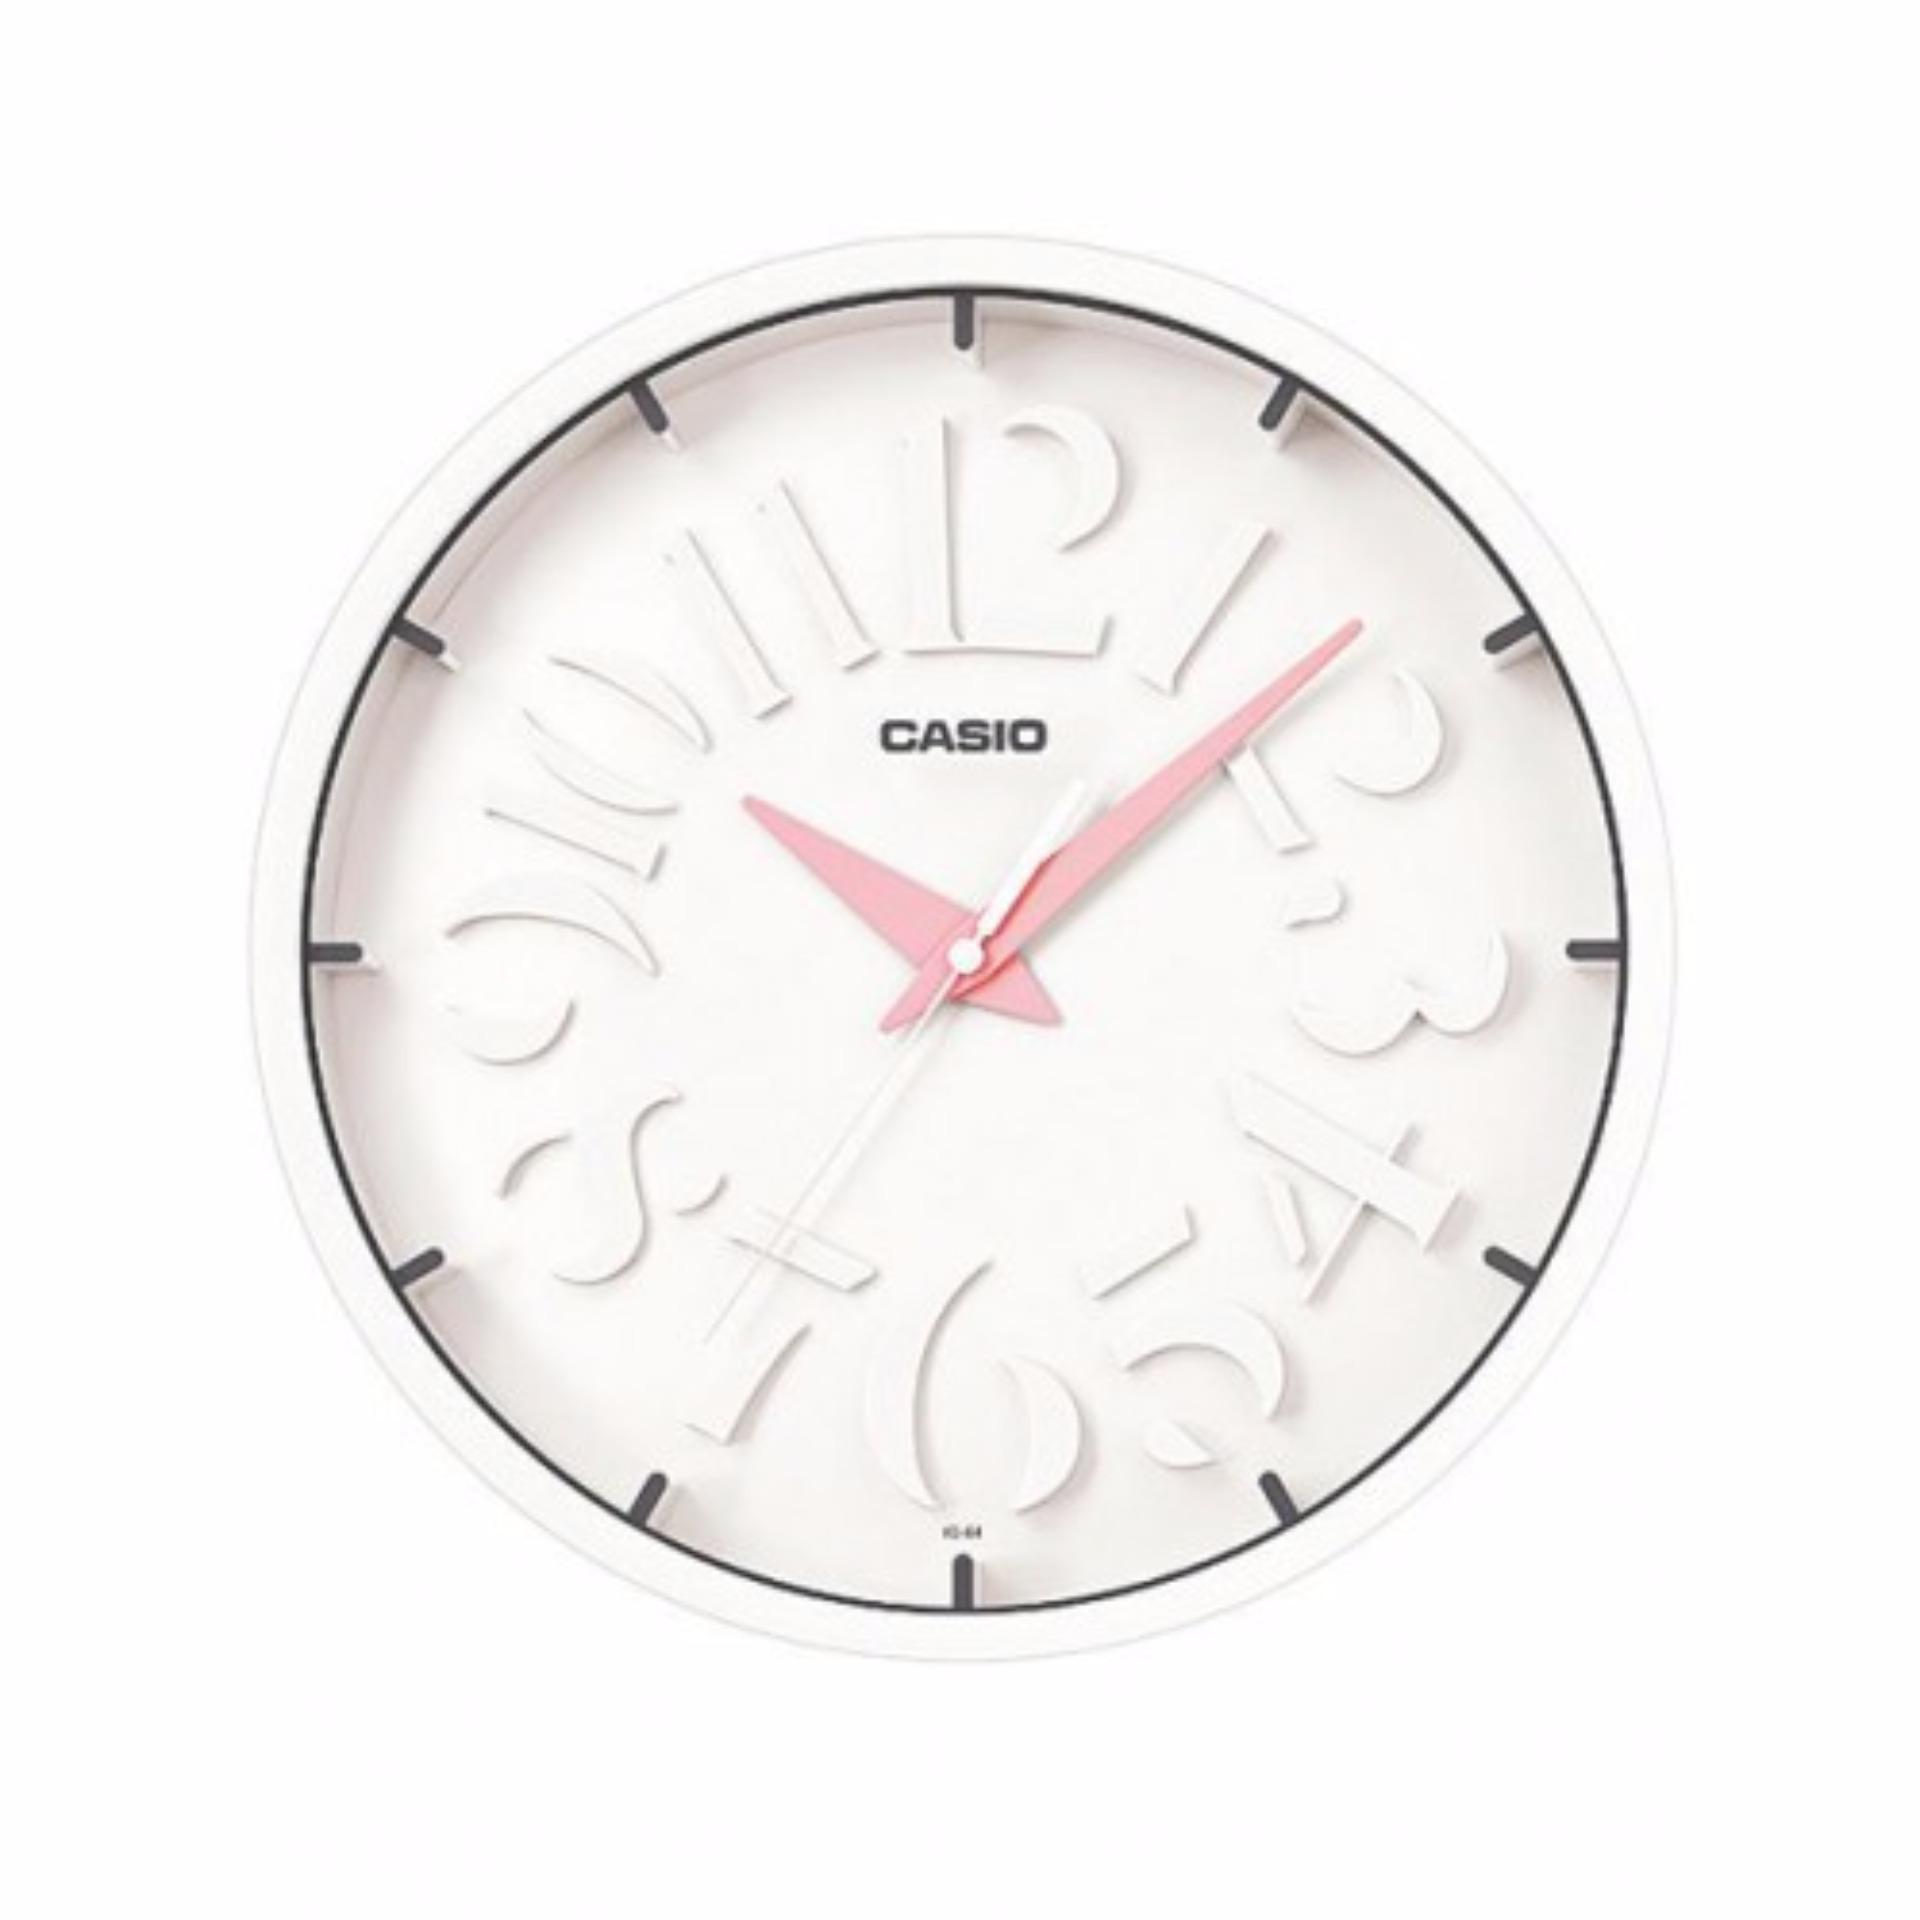 Casio wall clock iq 644df singapore casio wall clock iq 644df amipublicfo Choice Image